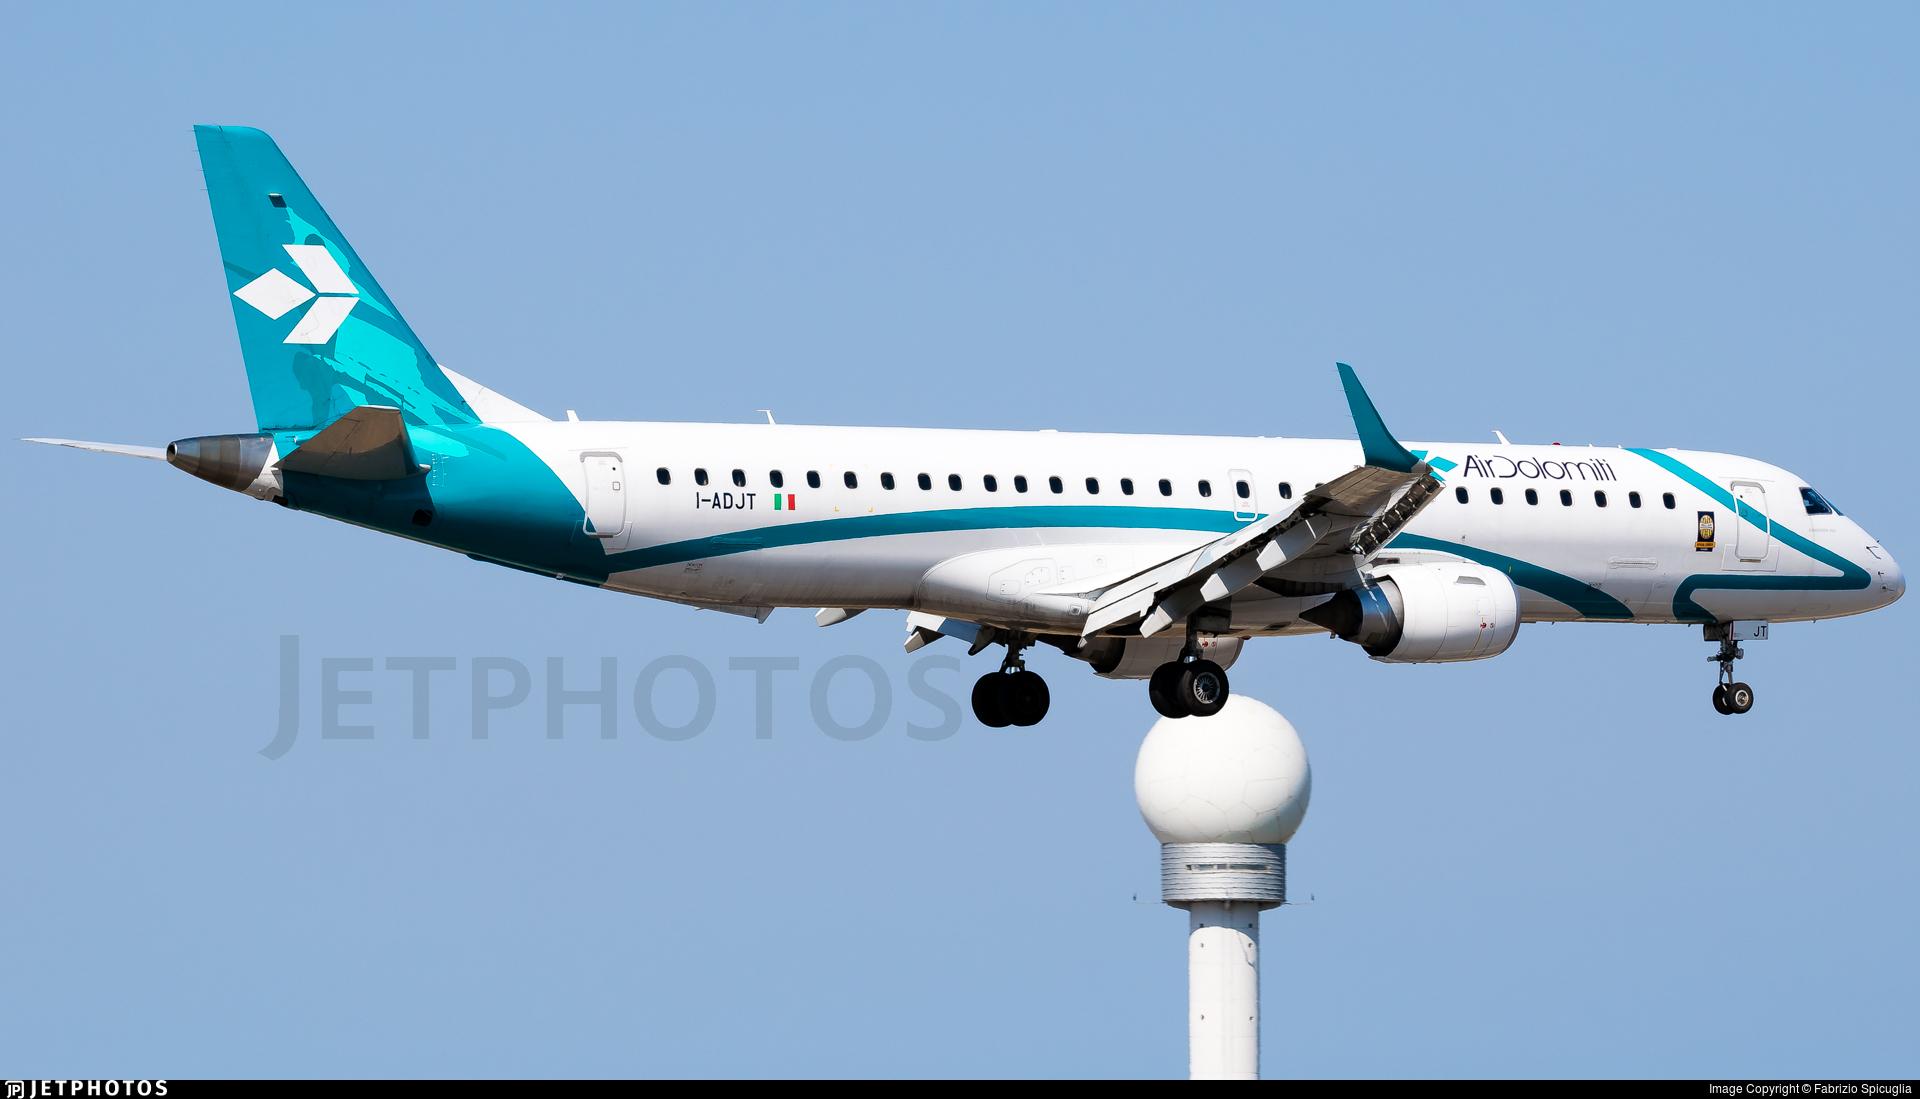 I-ADJT - Embraer 190-200LR - Air Dolomiti